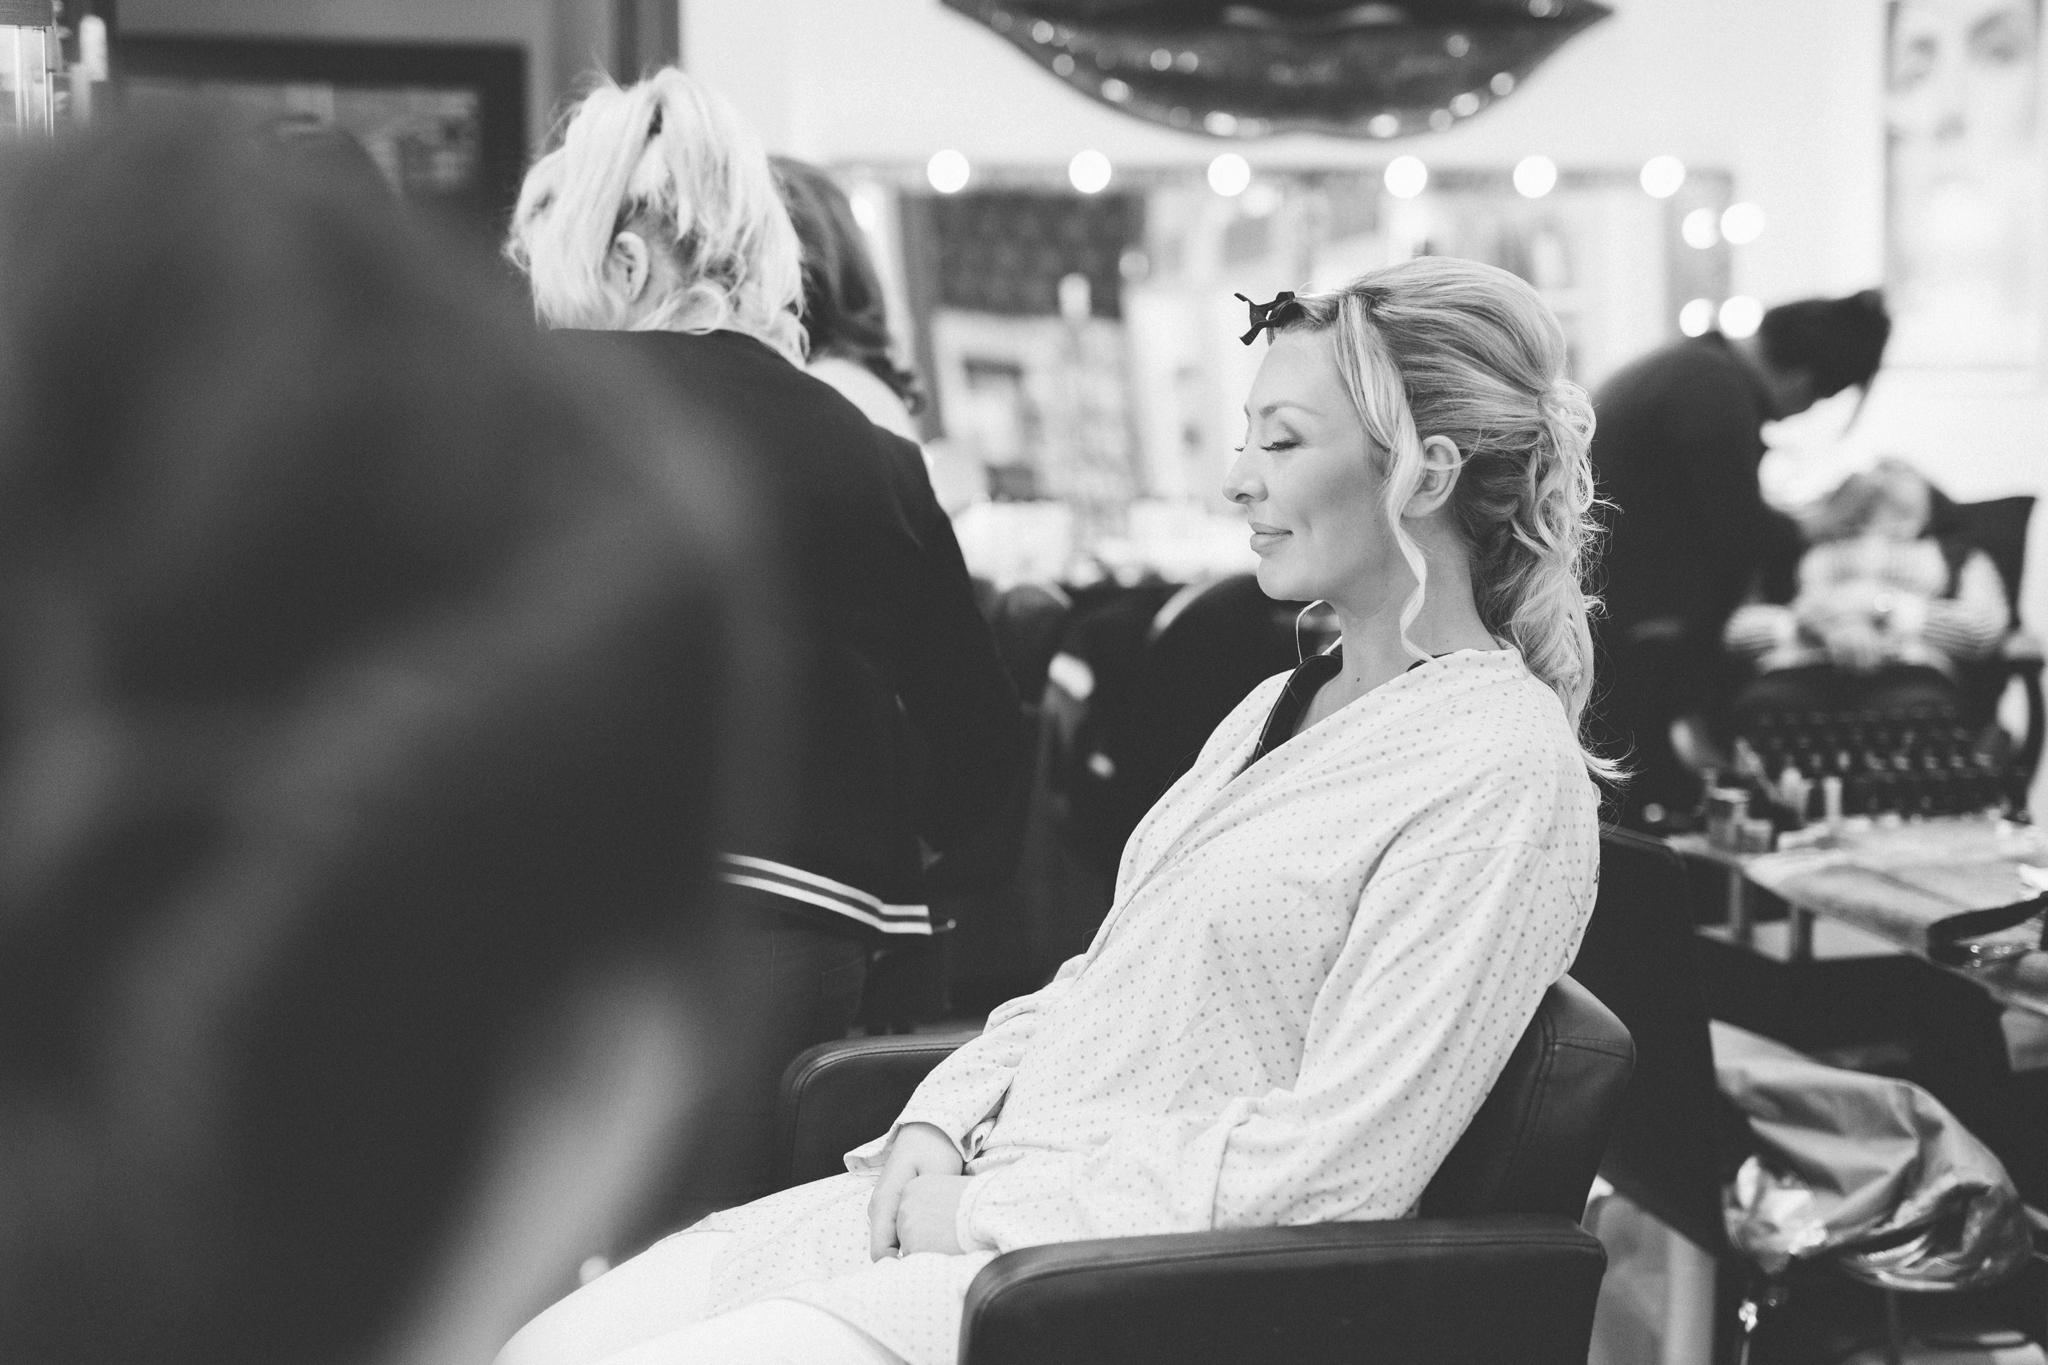 Suzanne_li_photography_Roman_camp_wedding_0002.jpg